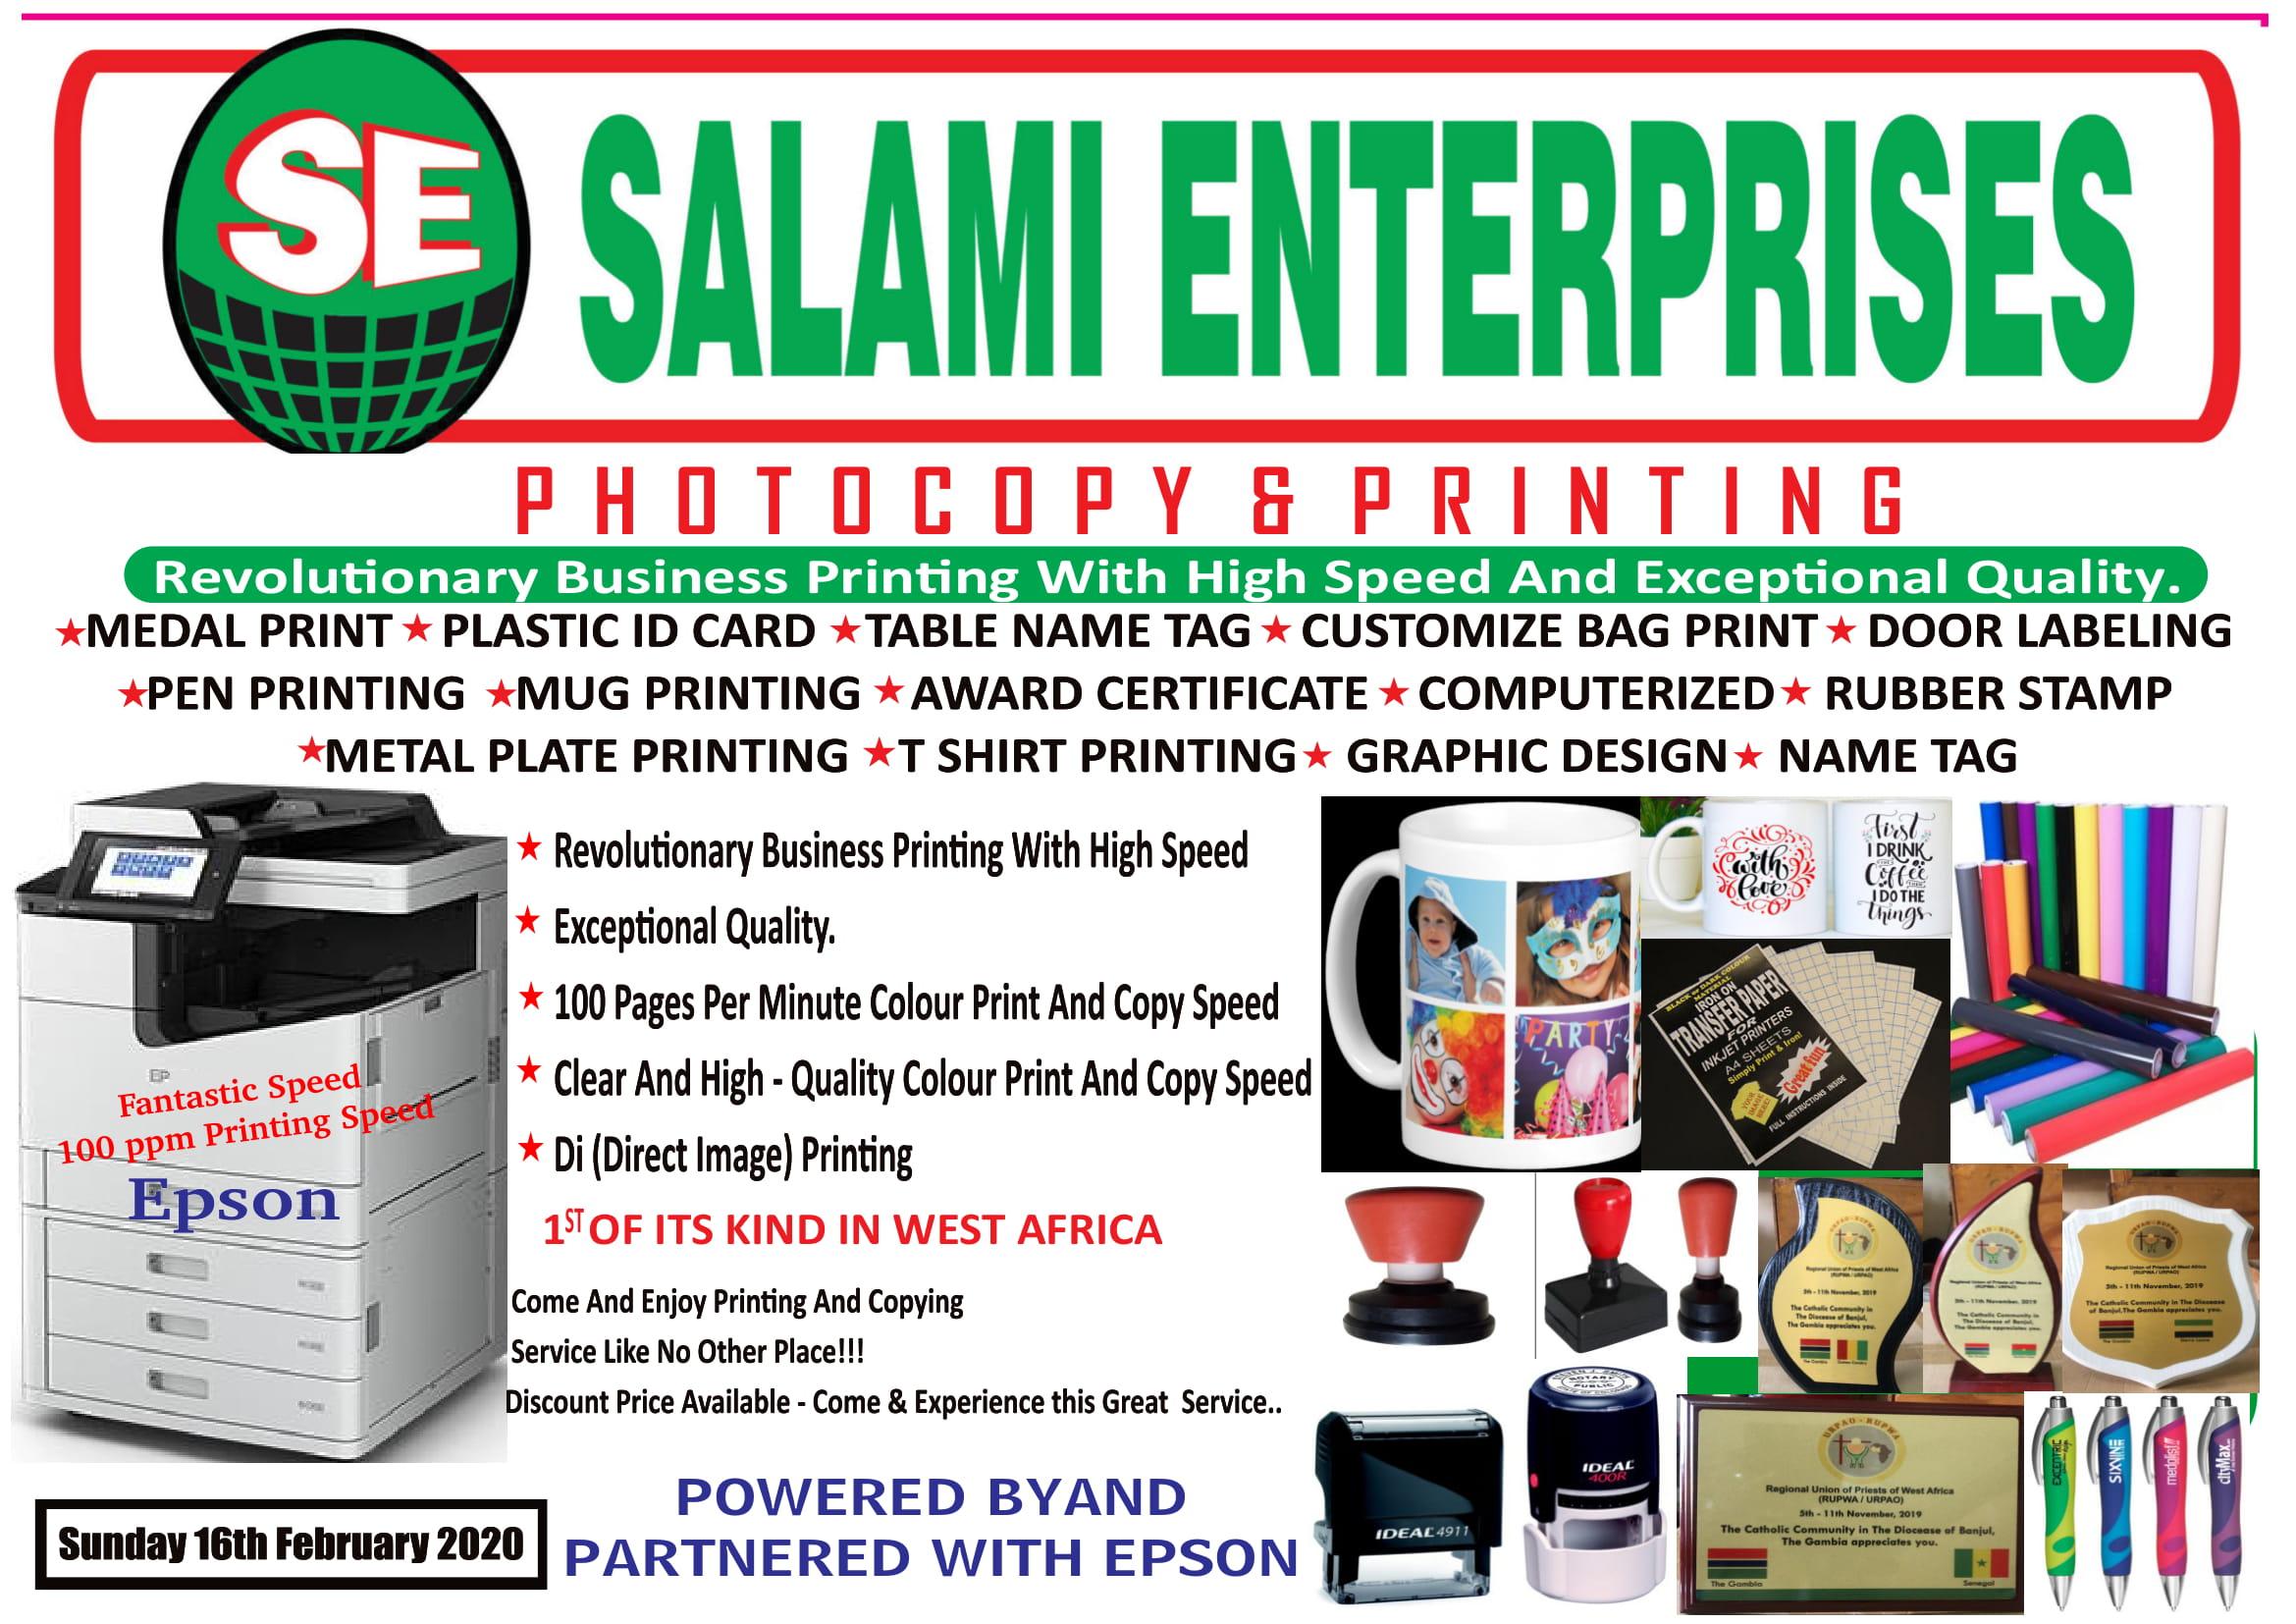 Salami Enterprises